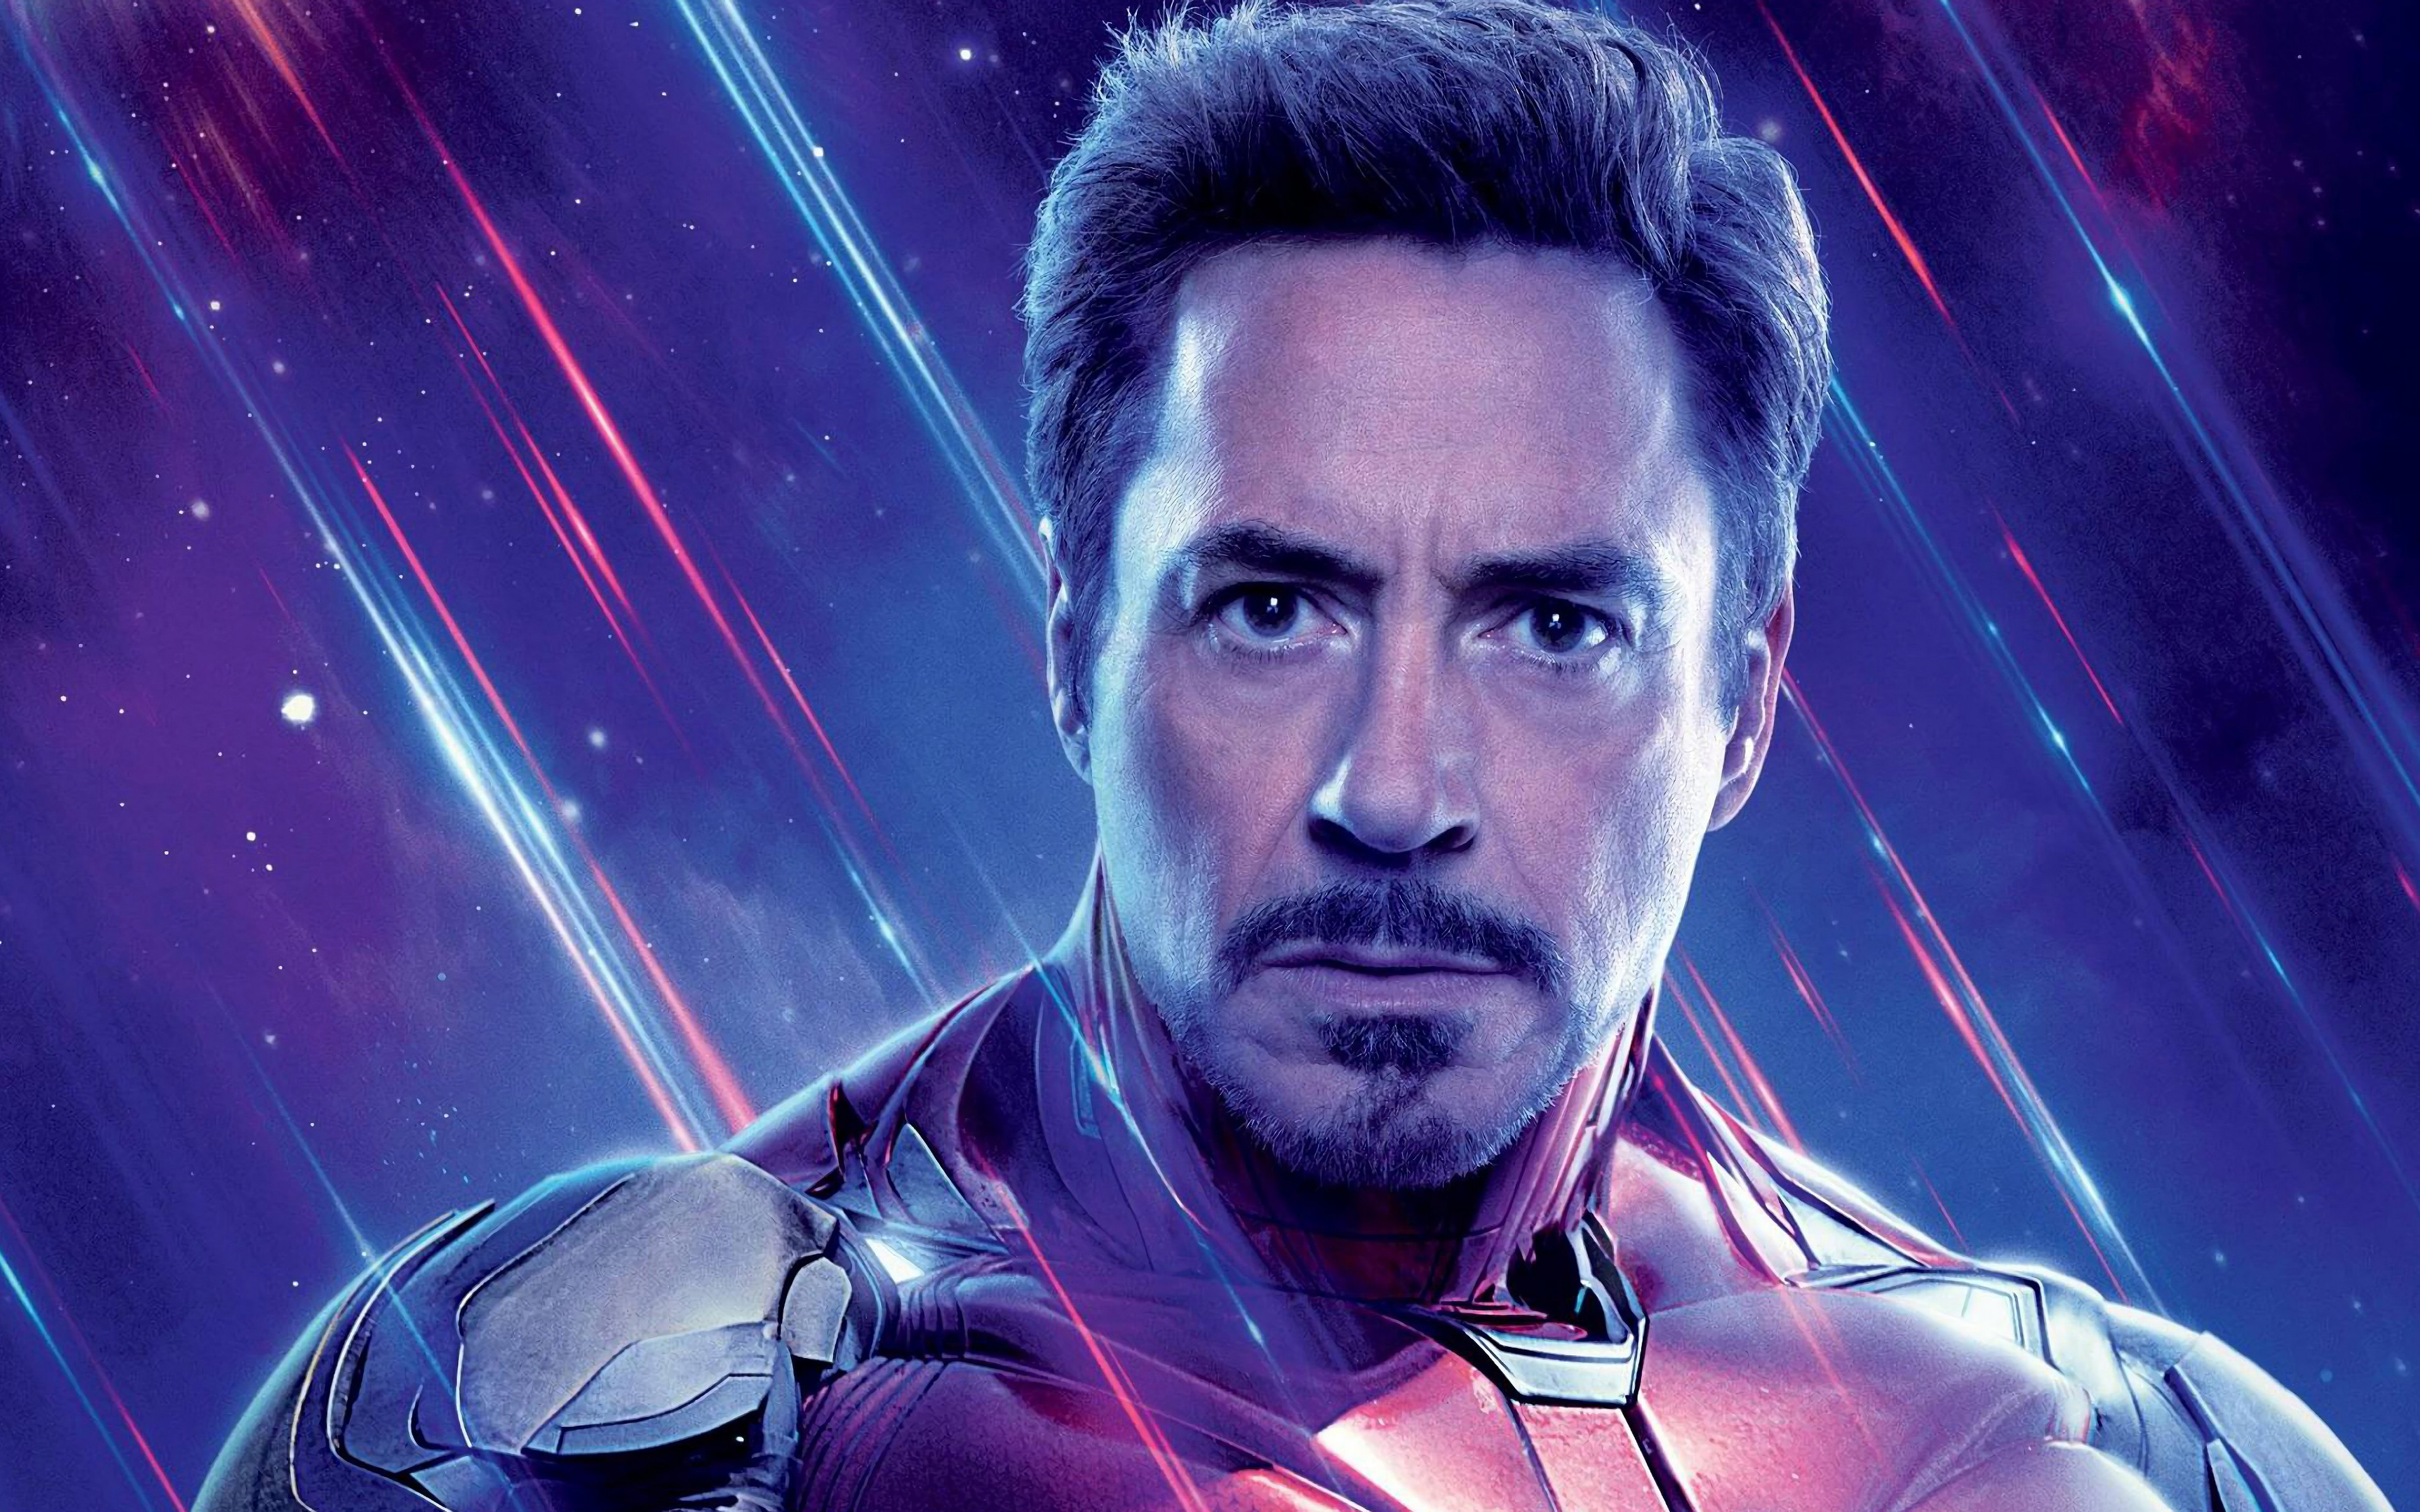 Download Avengers Endgame Tony Stark Wallpaper Hd Cikimmcom